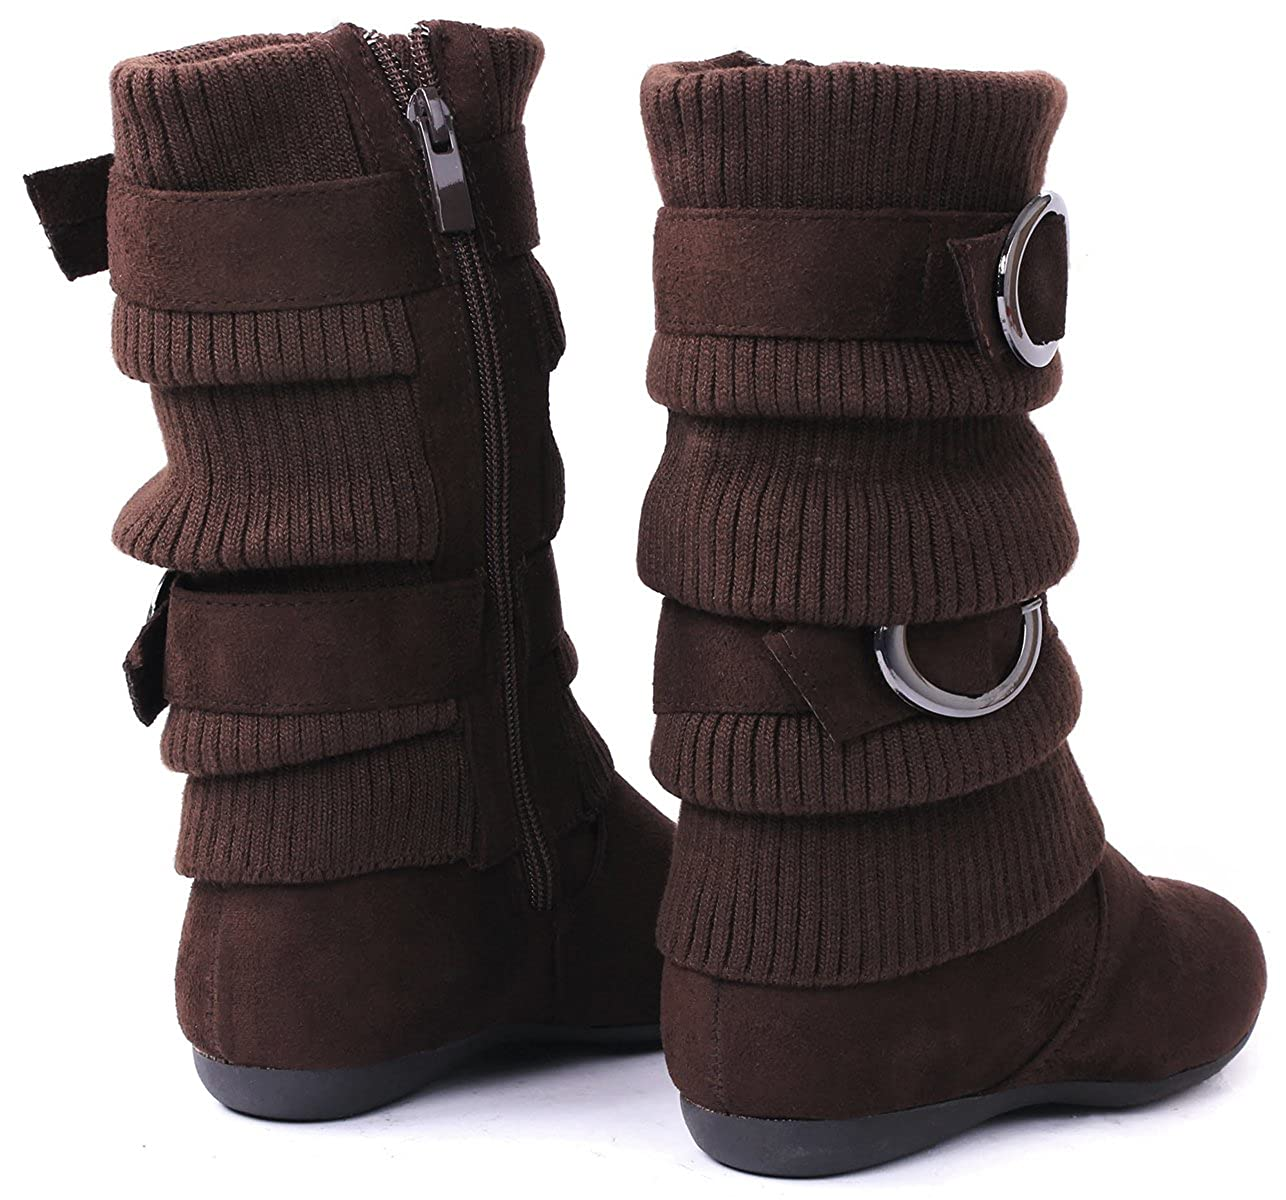 Lucky Top B21 Kids Warm Slouch Sweater-Cuff Dual Buckle Zipper Mid-Calf Boots